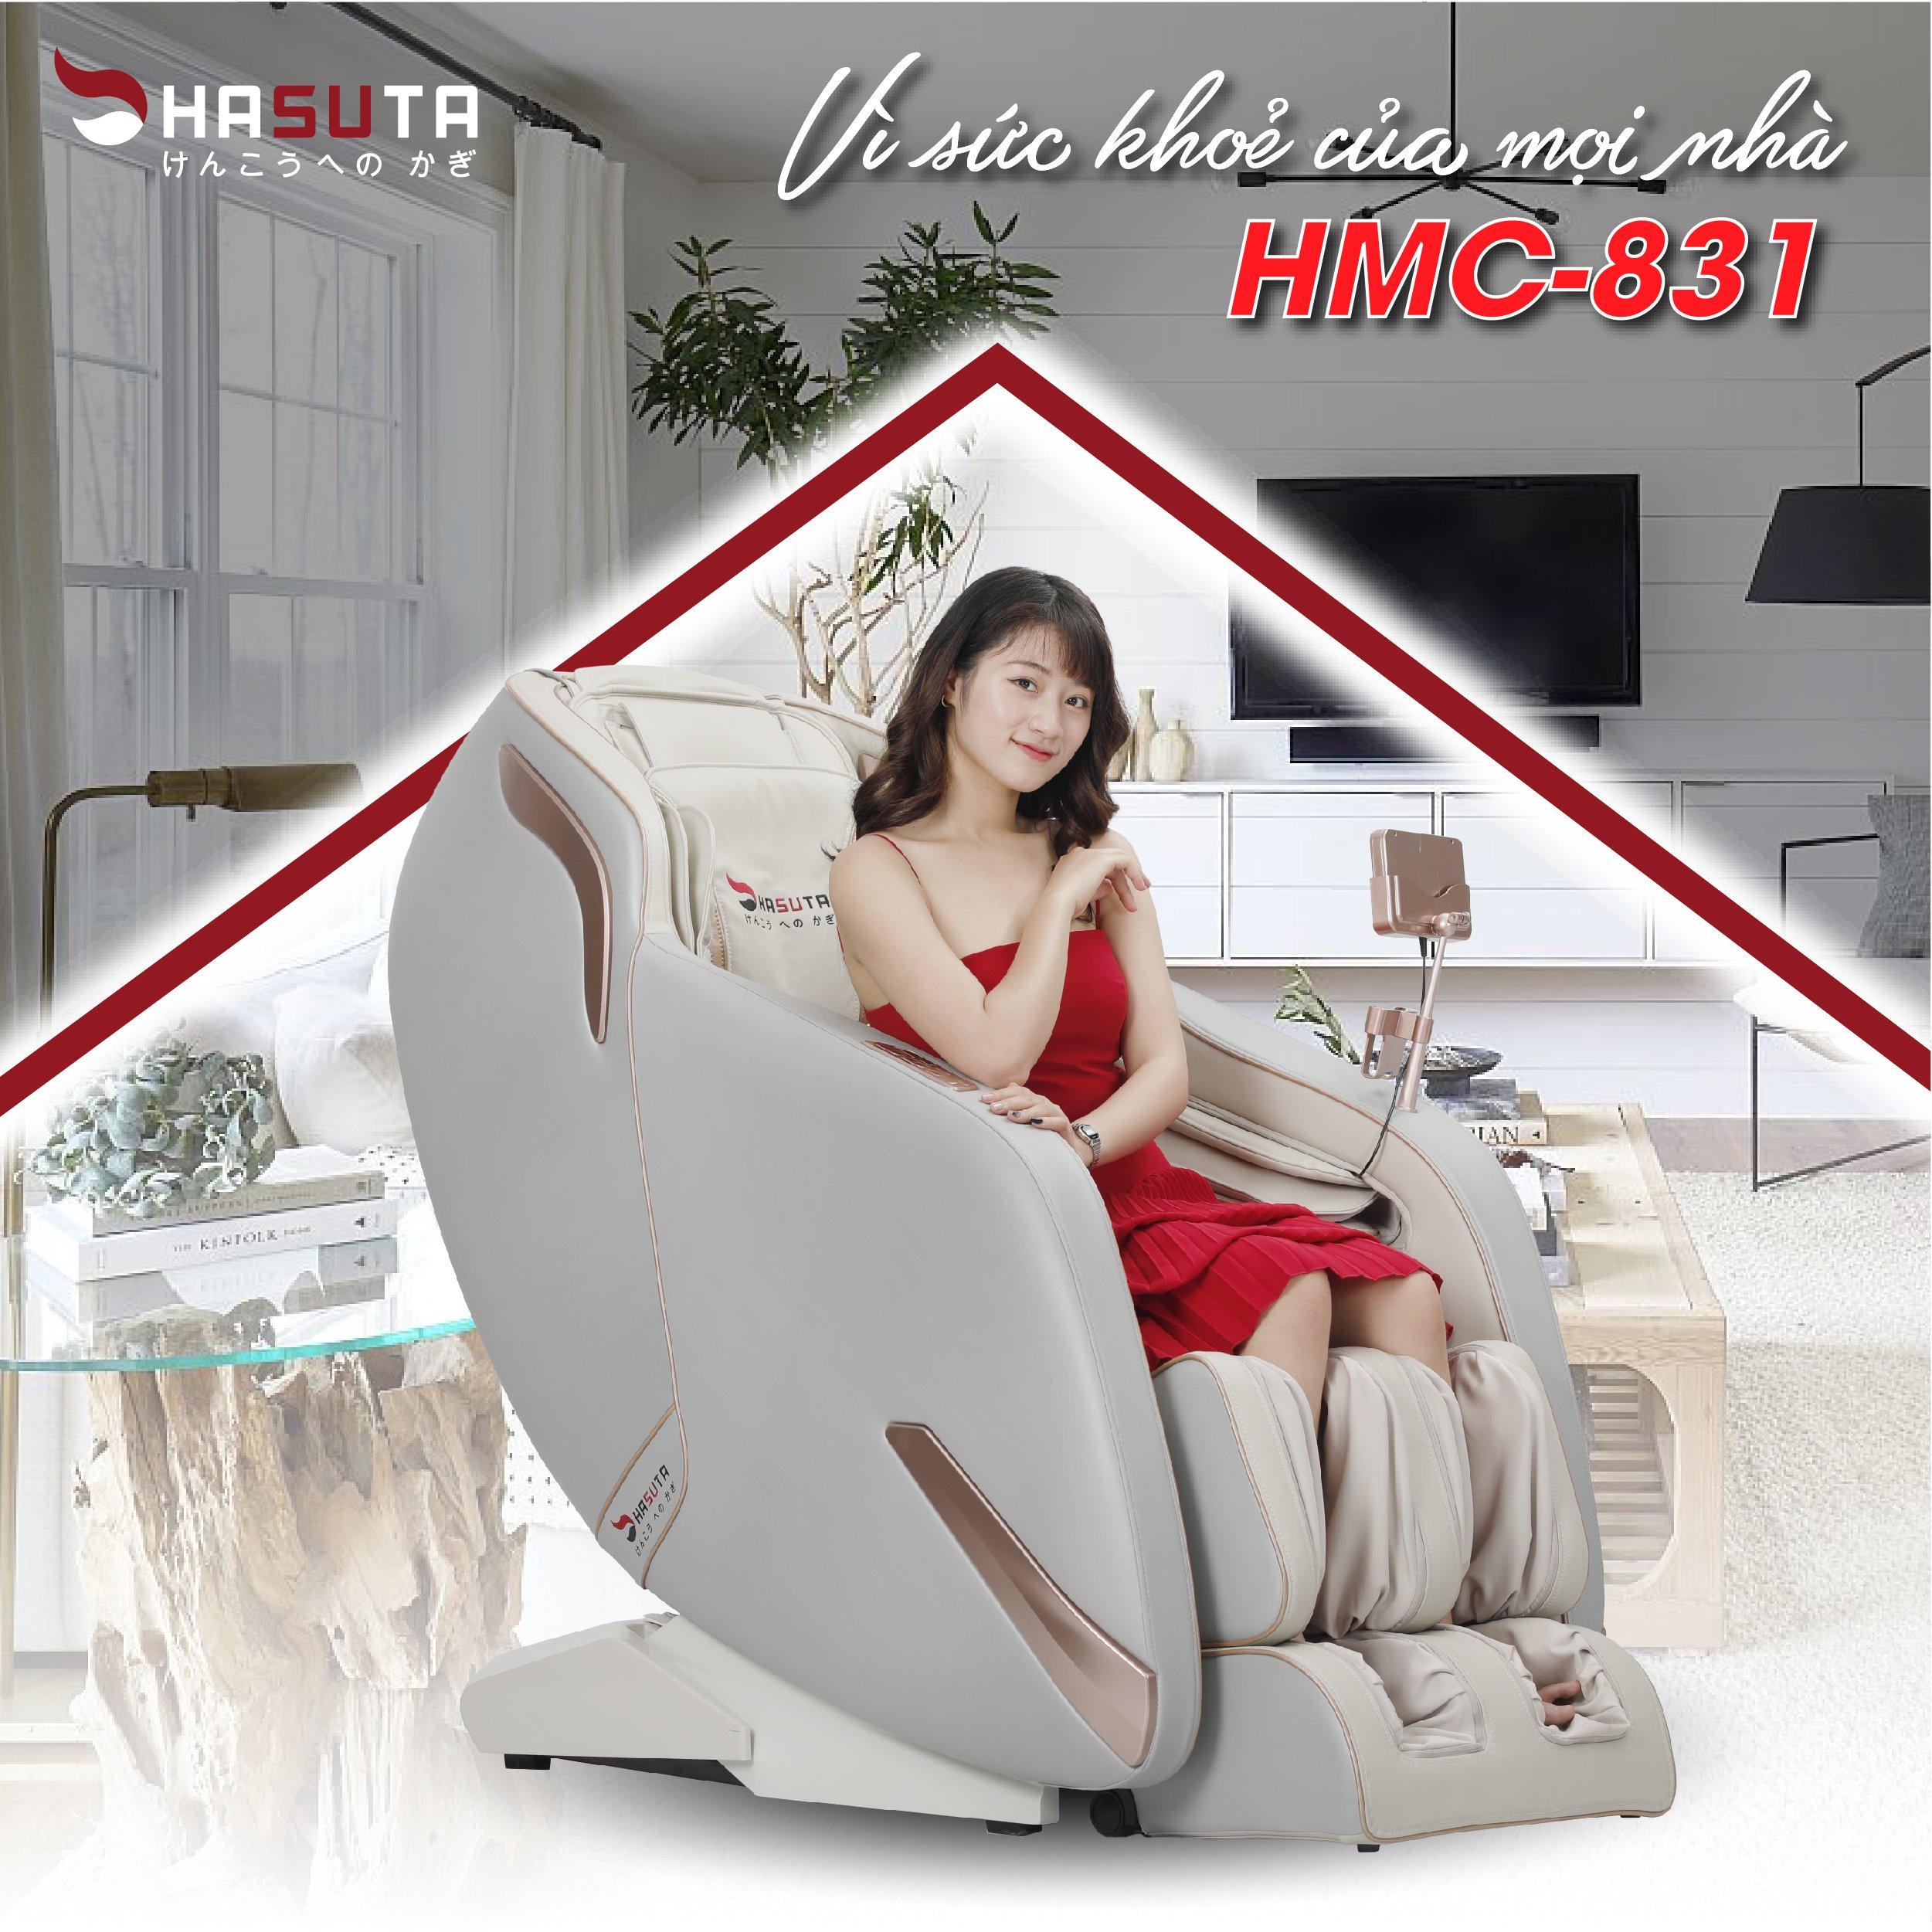 ghe massage hmc- 831